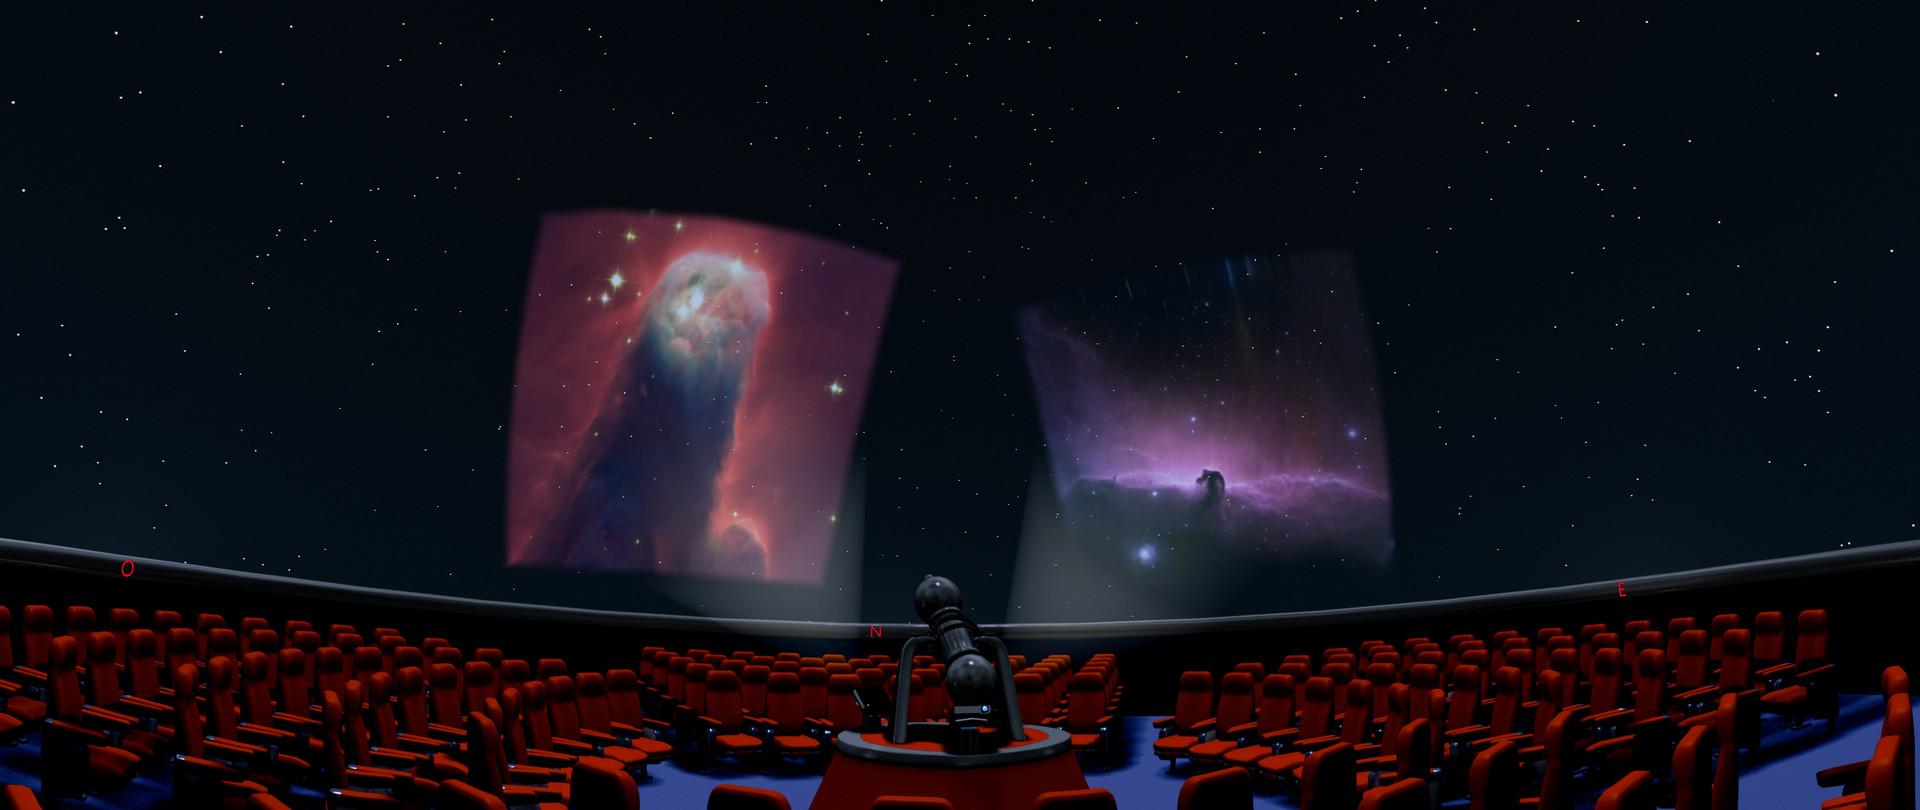 Juan antonio escoto planetariumwide